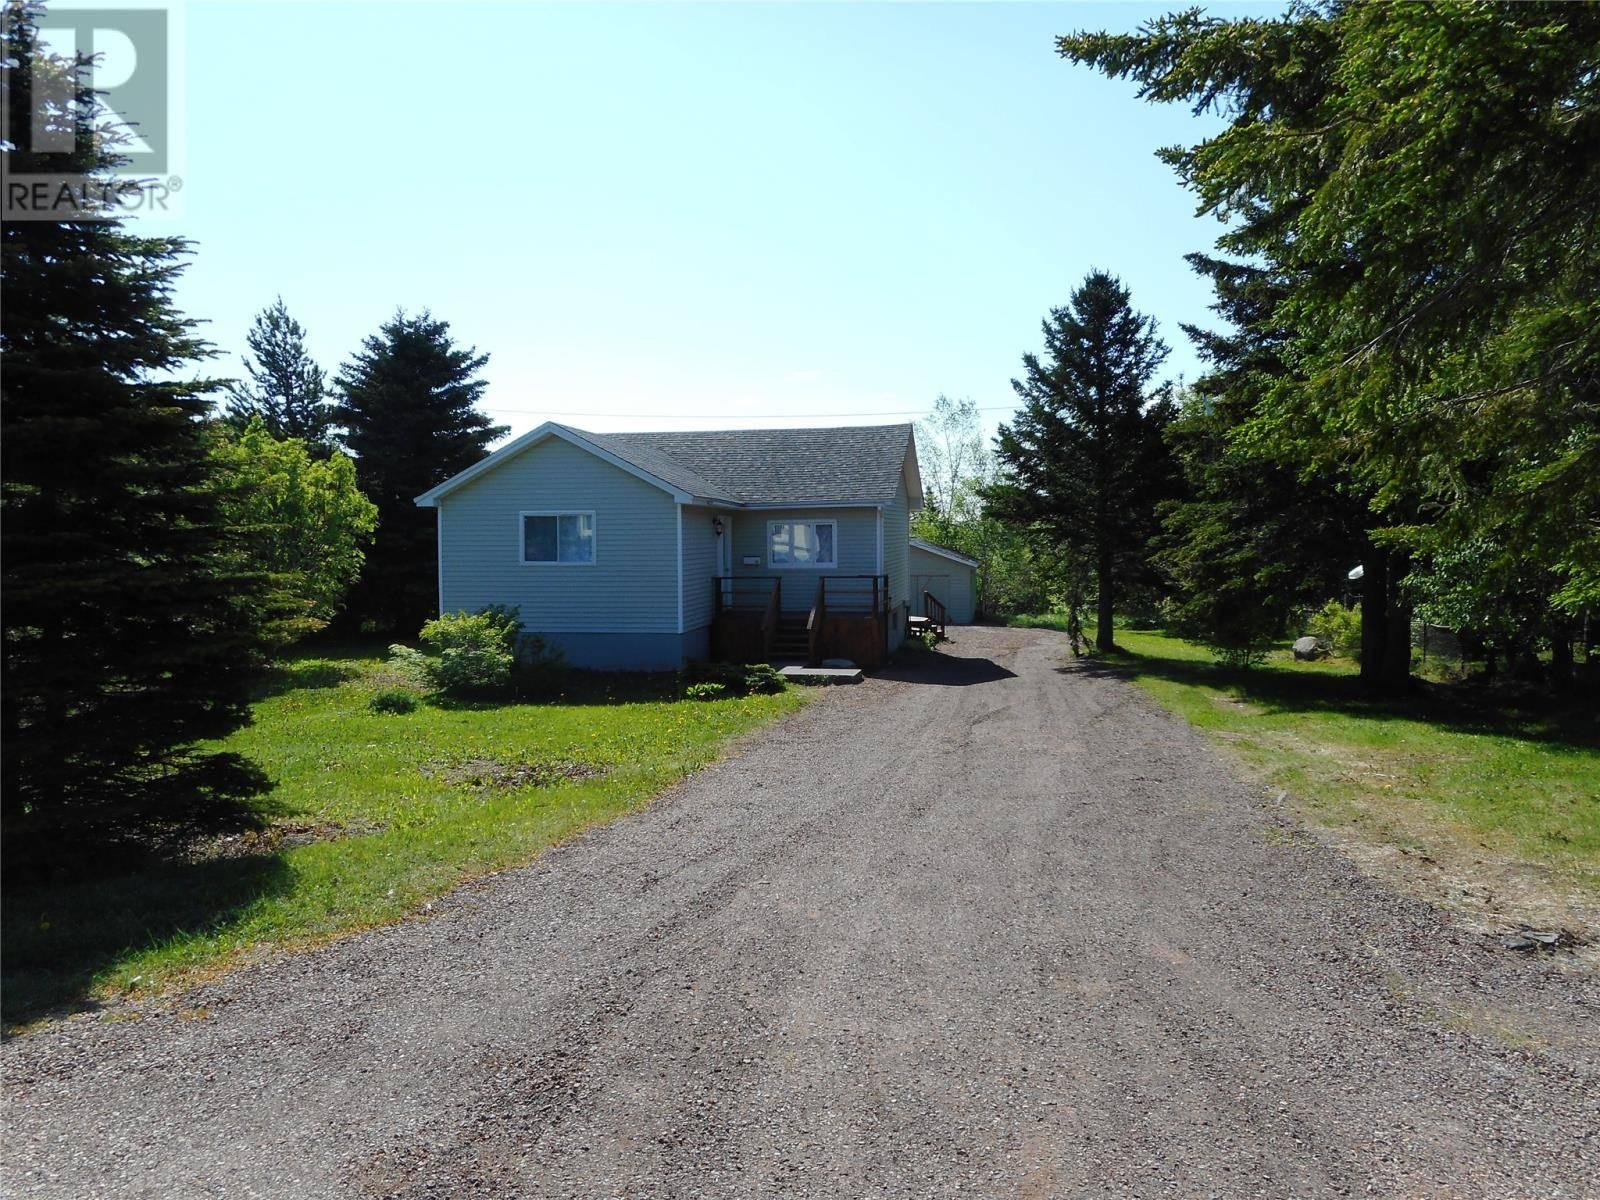 House for sale at 30 Grenfell Ht Grand Falls-windsor Newfoundland - MLS: 1209983